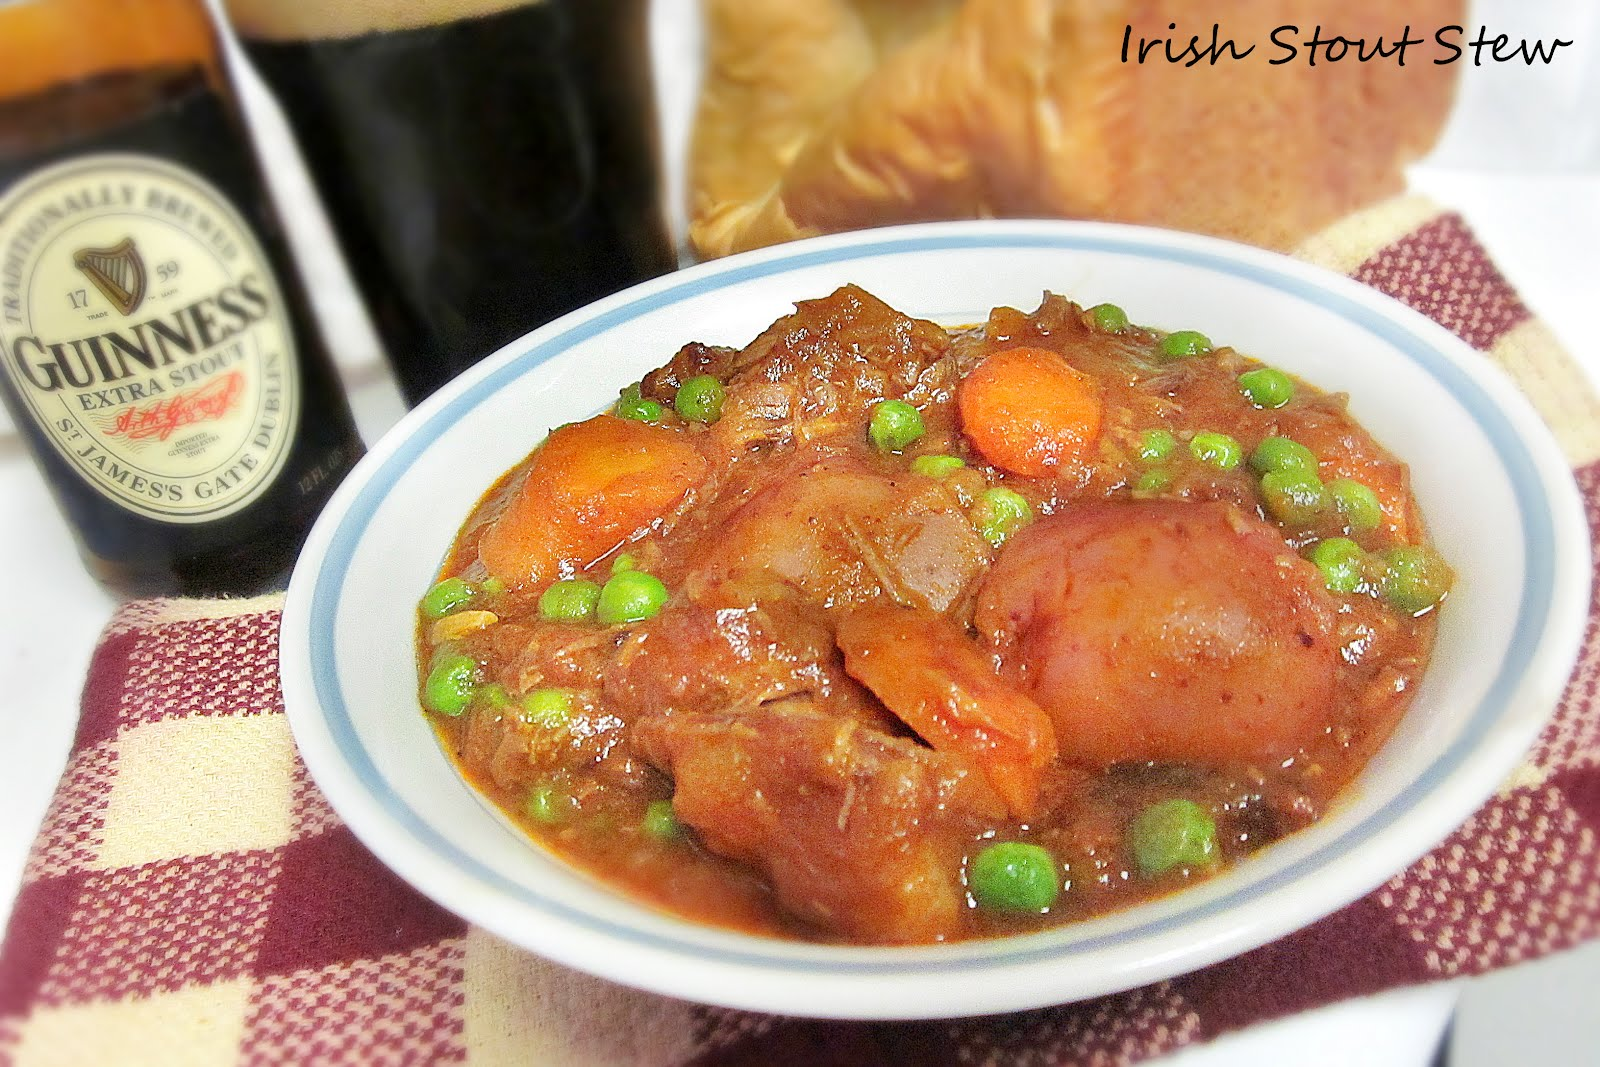 Diddles and Dumplings: Irish Stout Stew